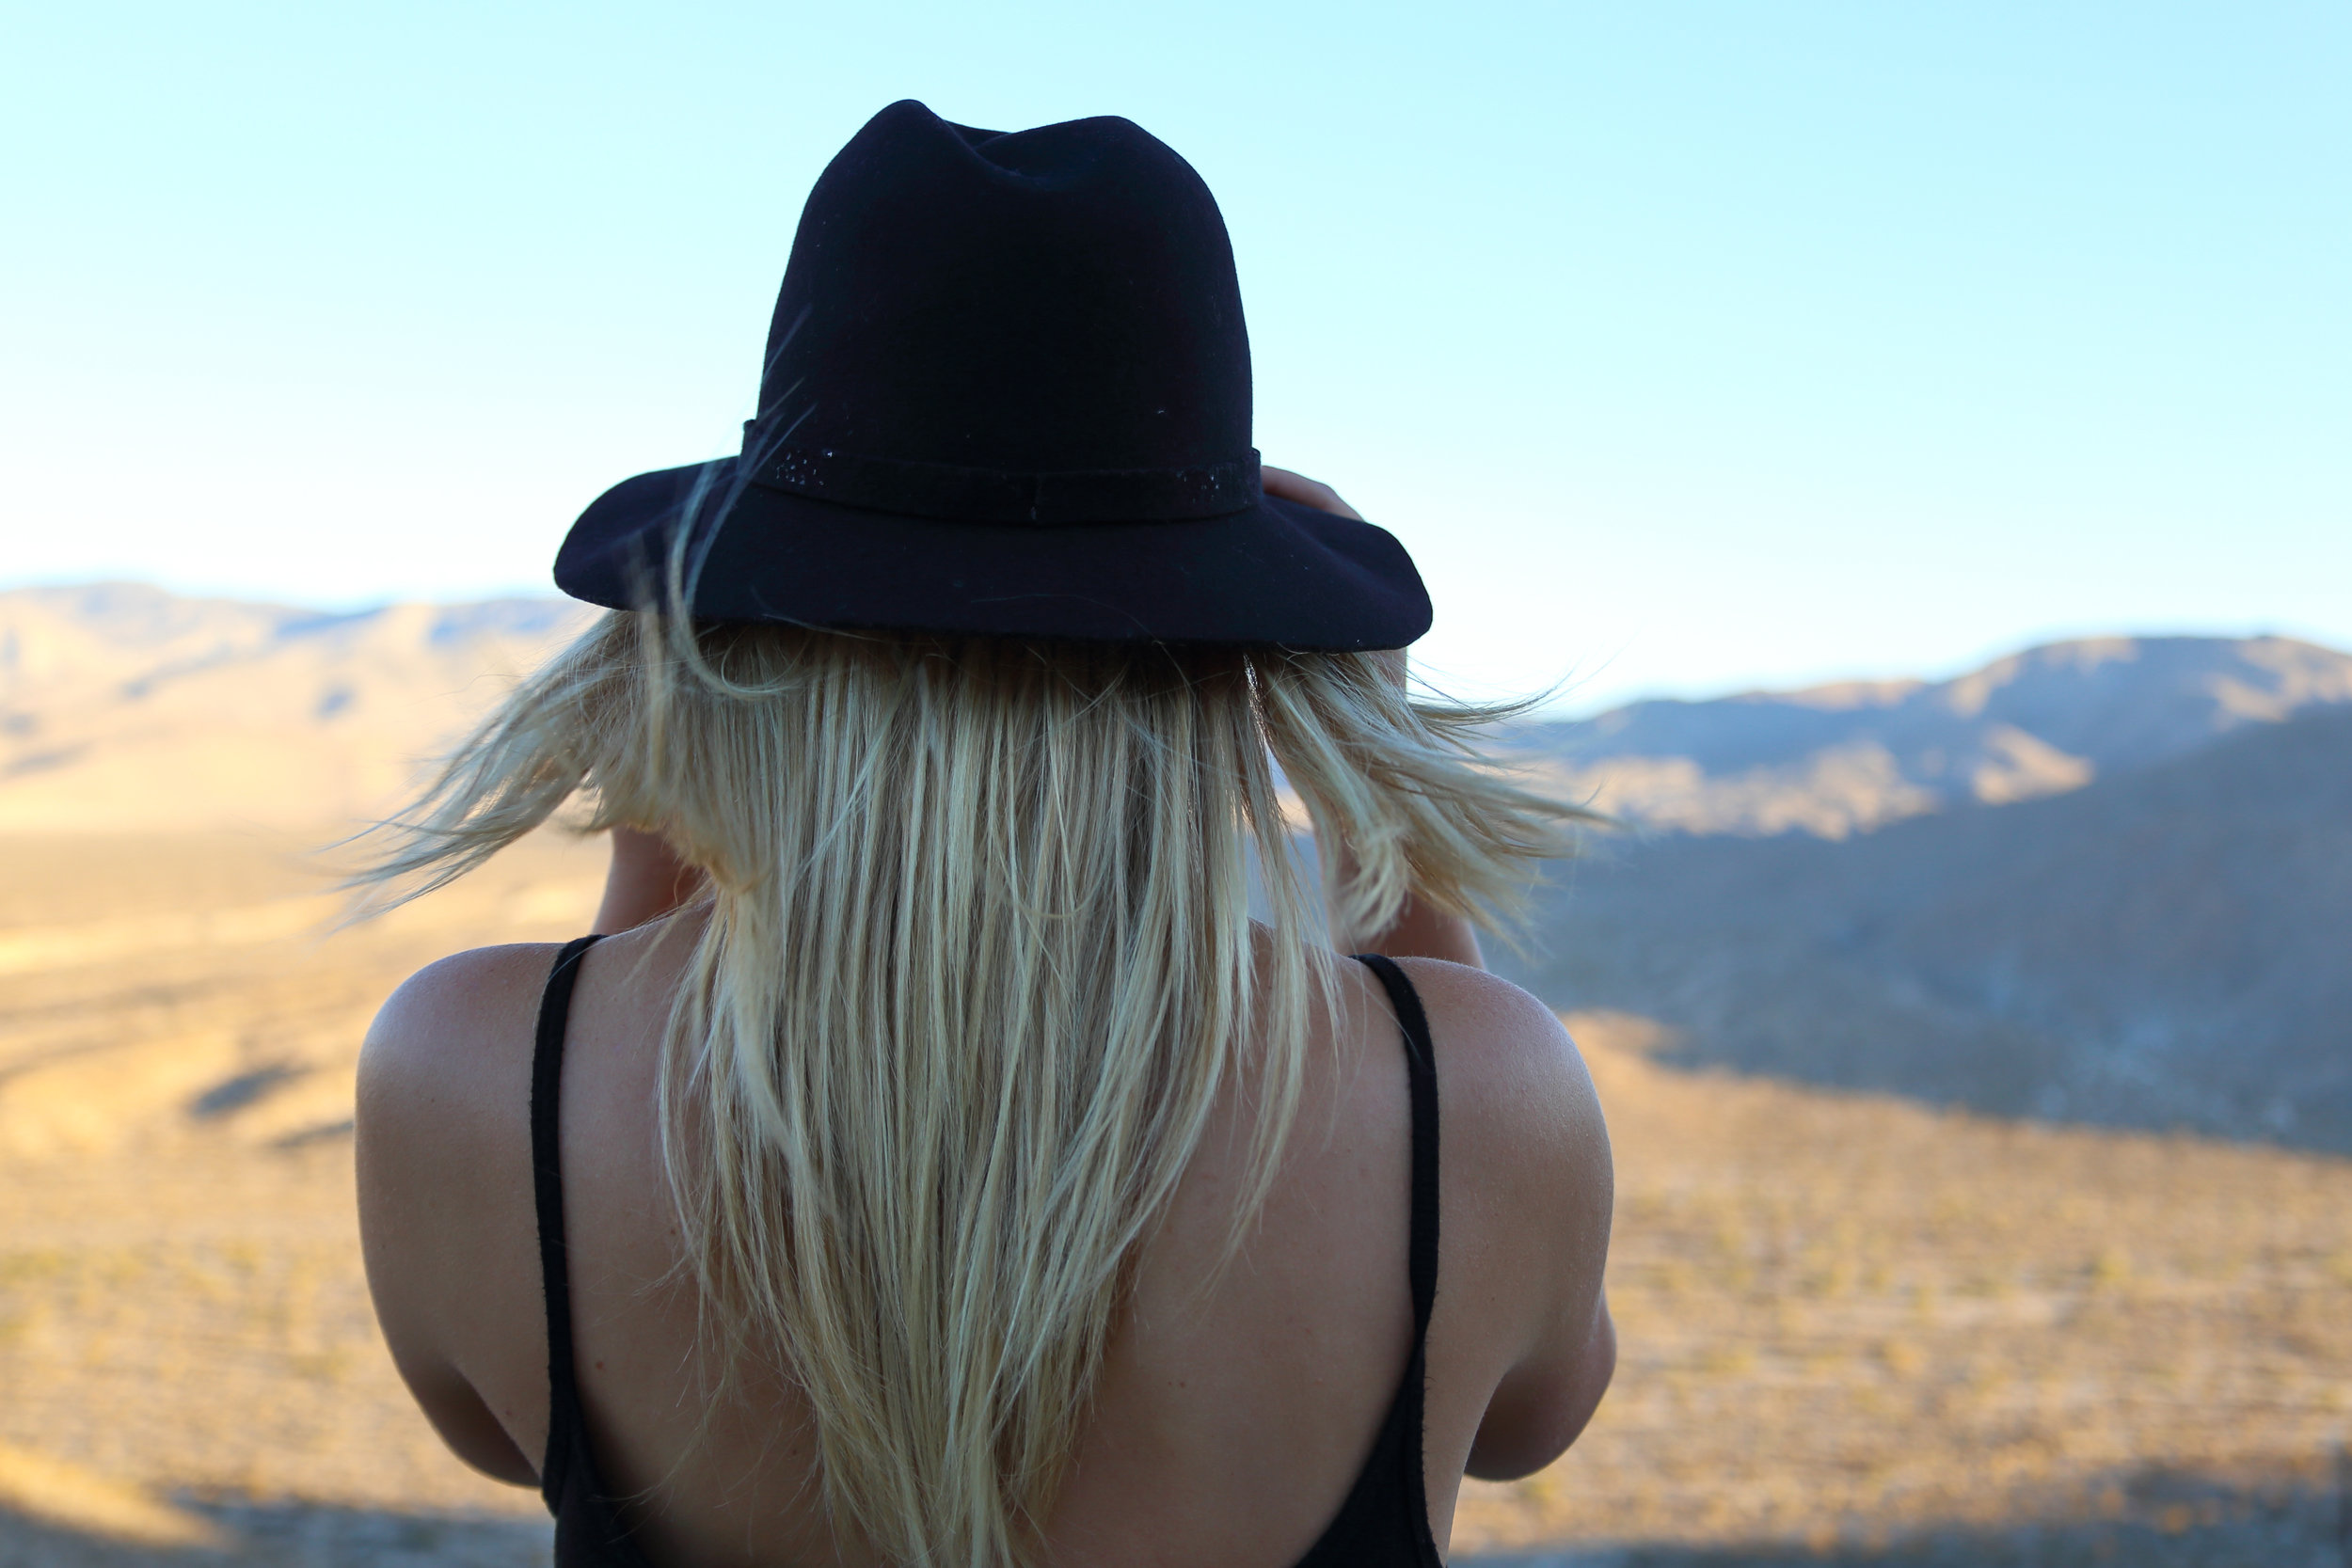 Admiring the desert vista.